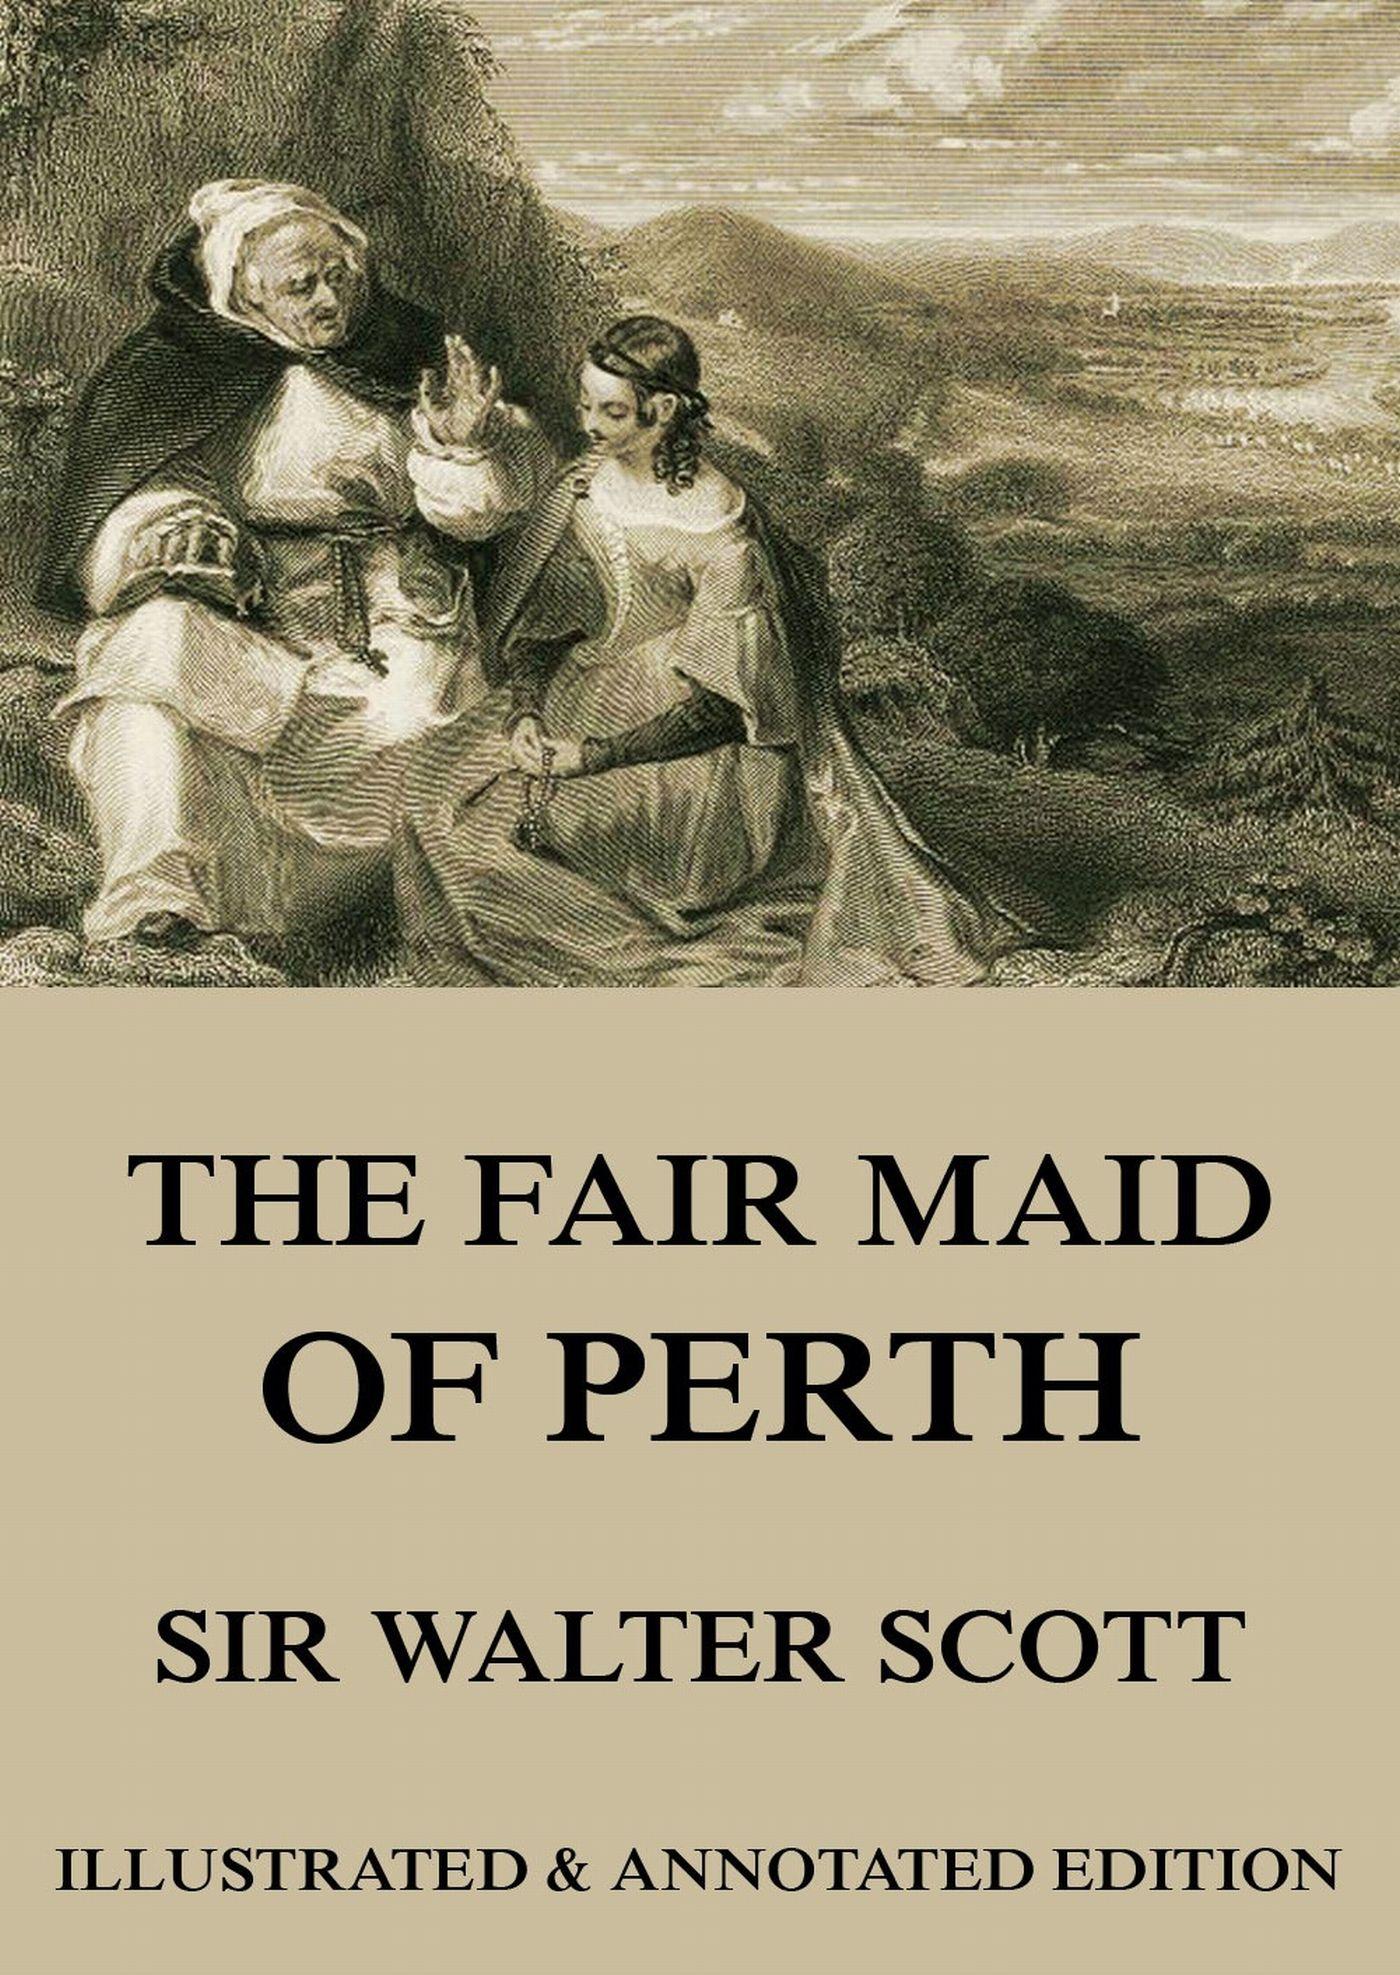 Вальтер Скотт The Fair Maid of Perth scott w the fair maid of perth пертская красавица на английском языке